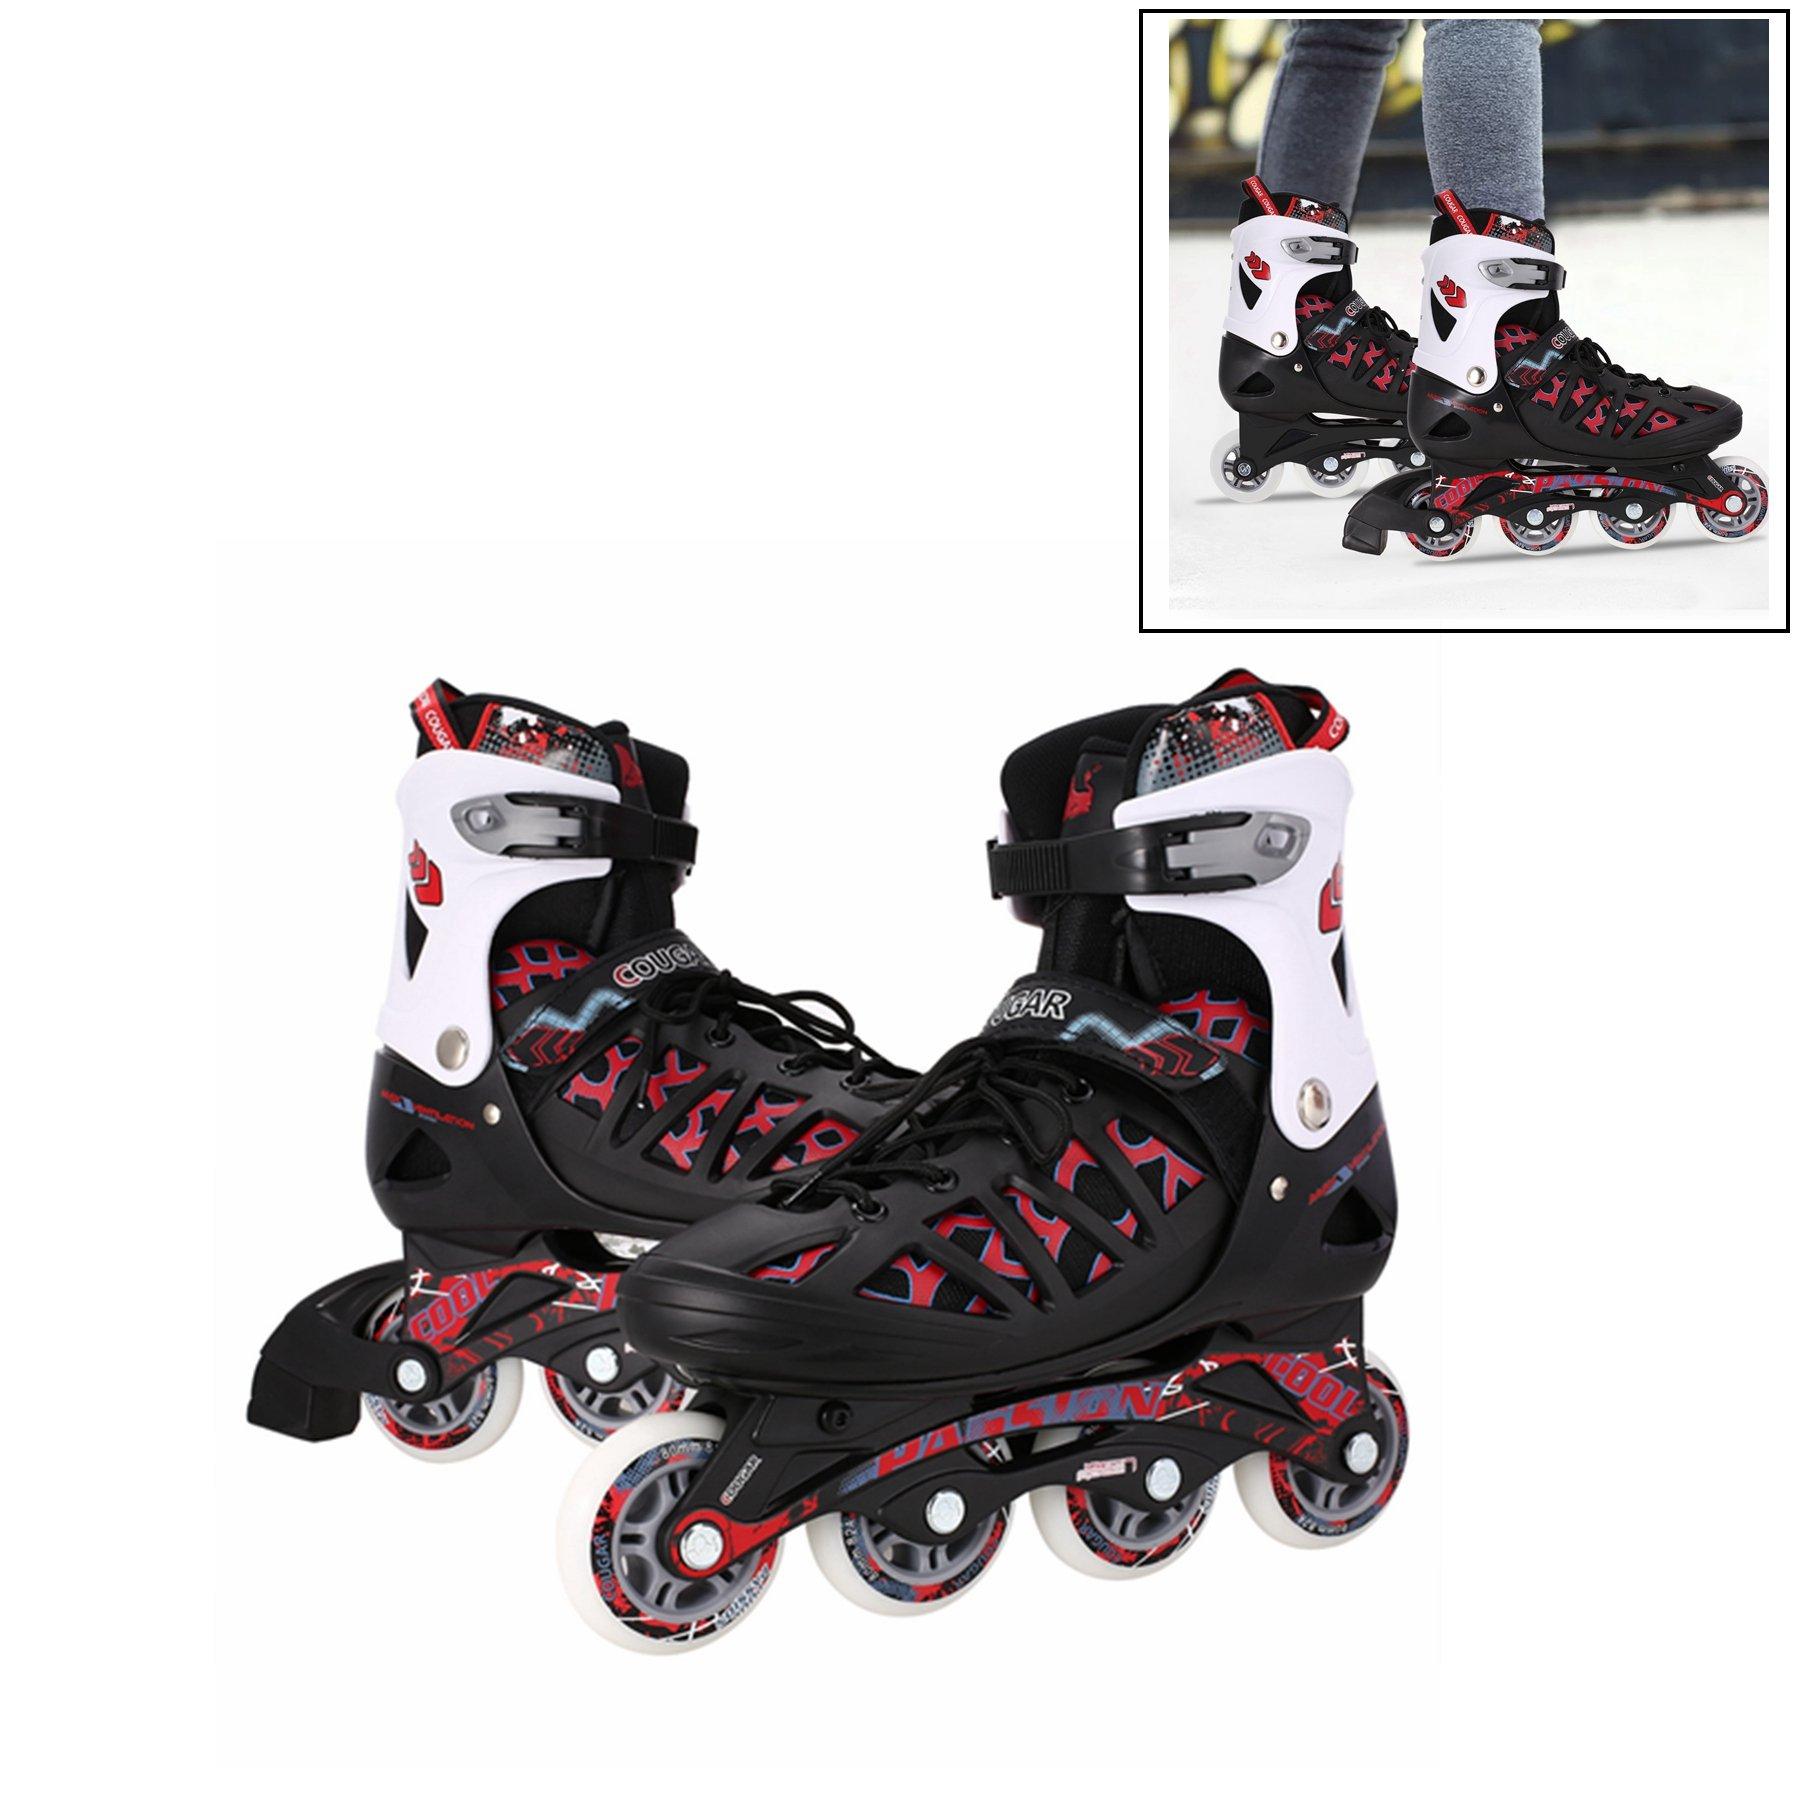 Leoneva Adult Adjustable Inline Skates for Men/Women/Teen, Outdoor Roller Skates for Training (US Stock, Blue/Black/Silver) (Black, US Size 4-7) by Leoneva